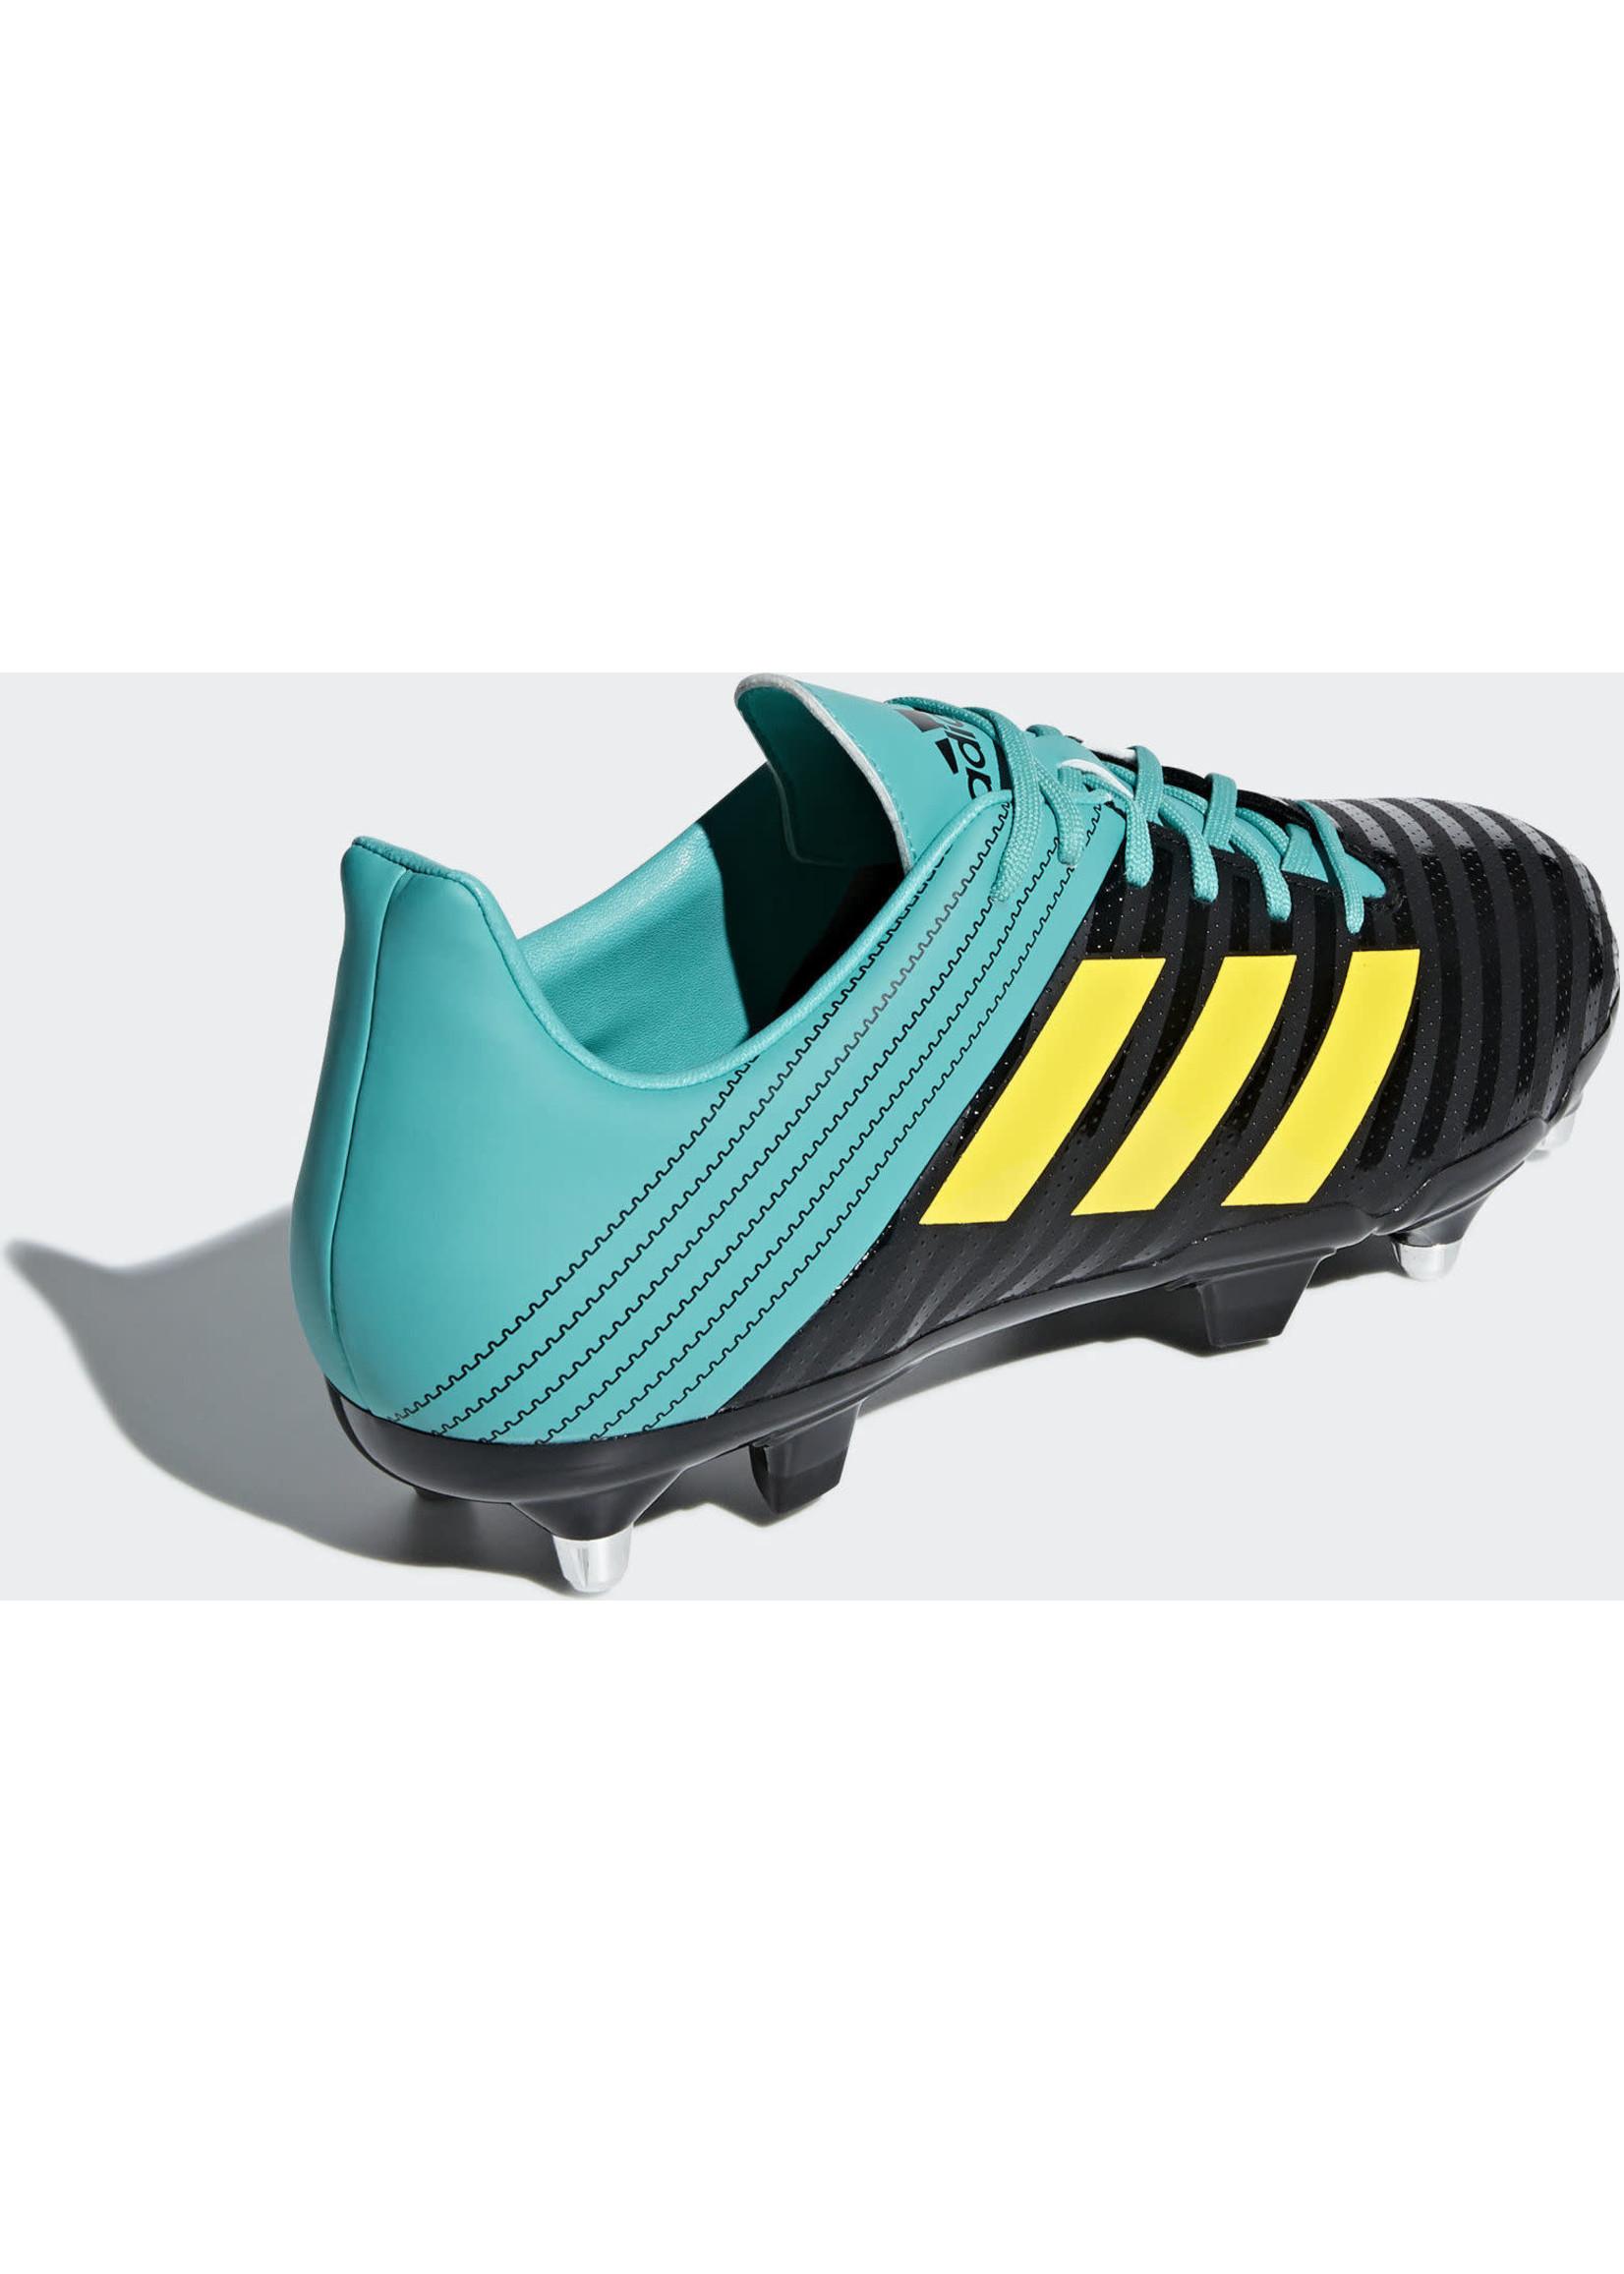 Adidas Adidas Malice SG Rugby Boot